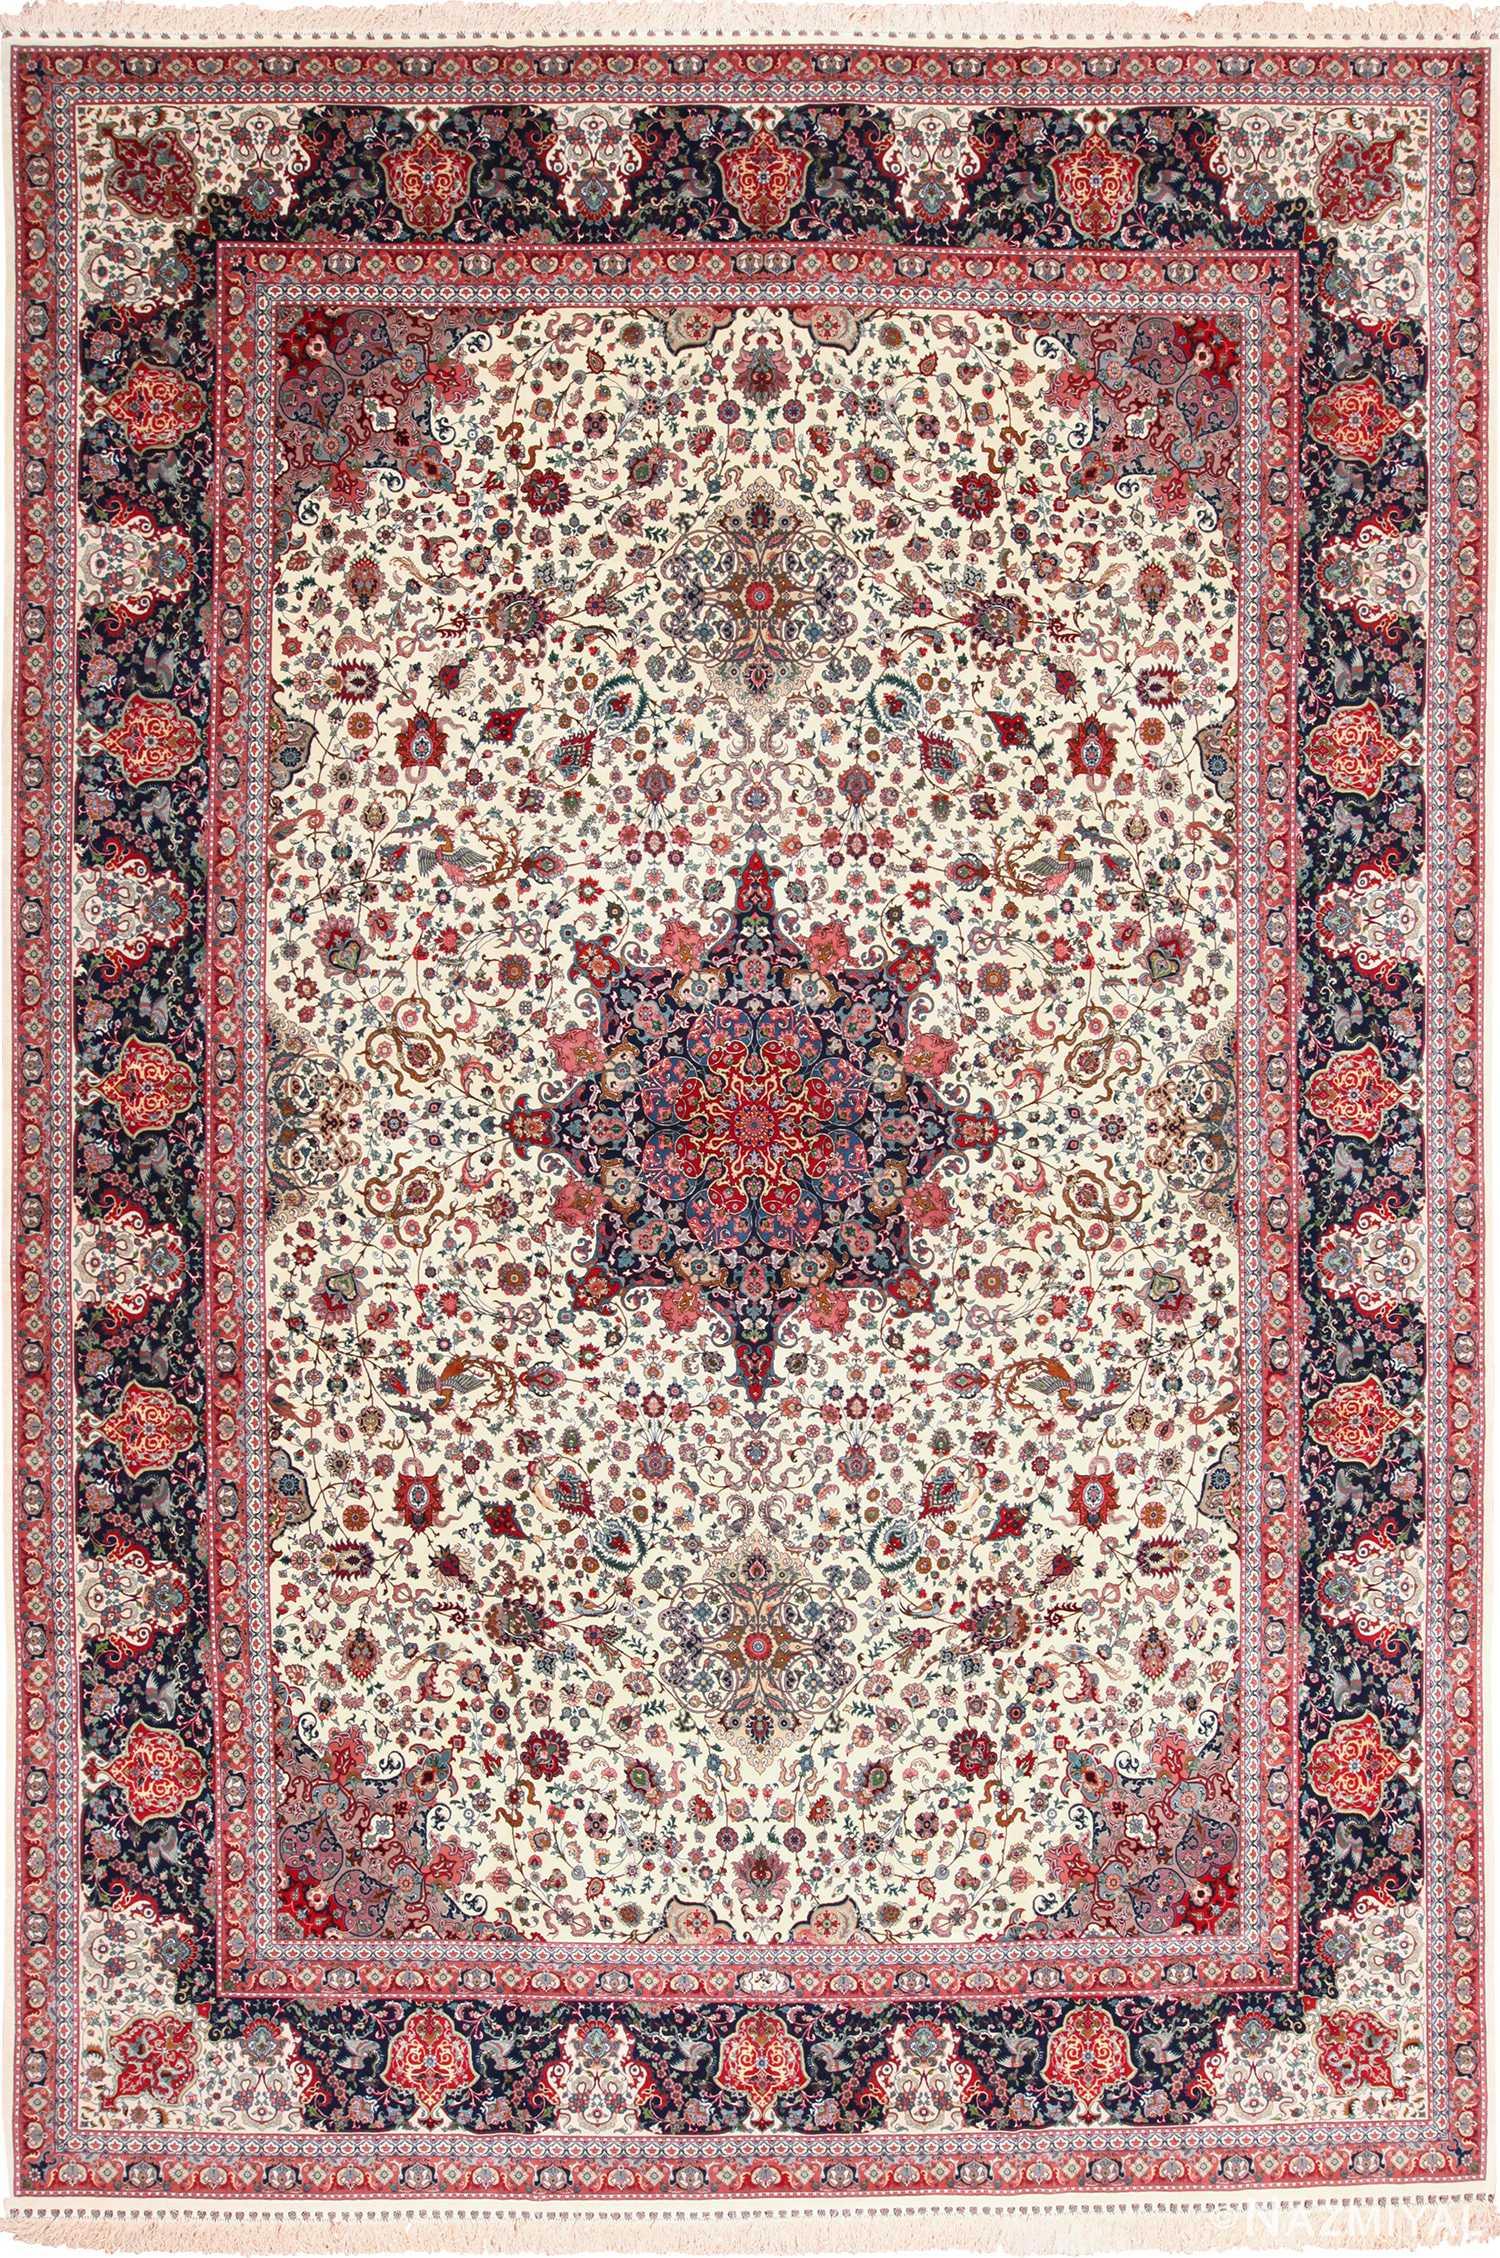 Large Vintage Silk and Wool Persian Tabriz Rug 60016 by Nazmiyal